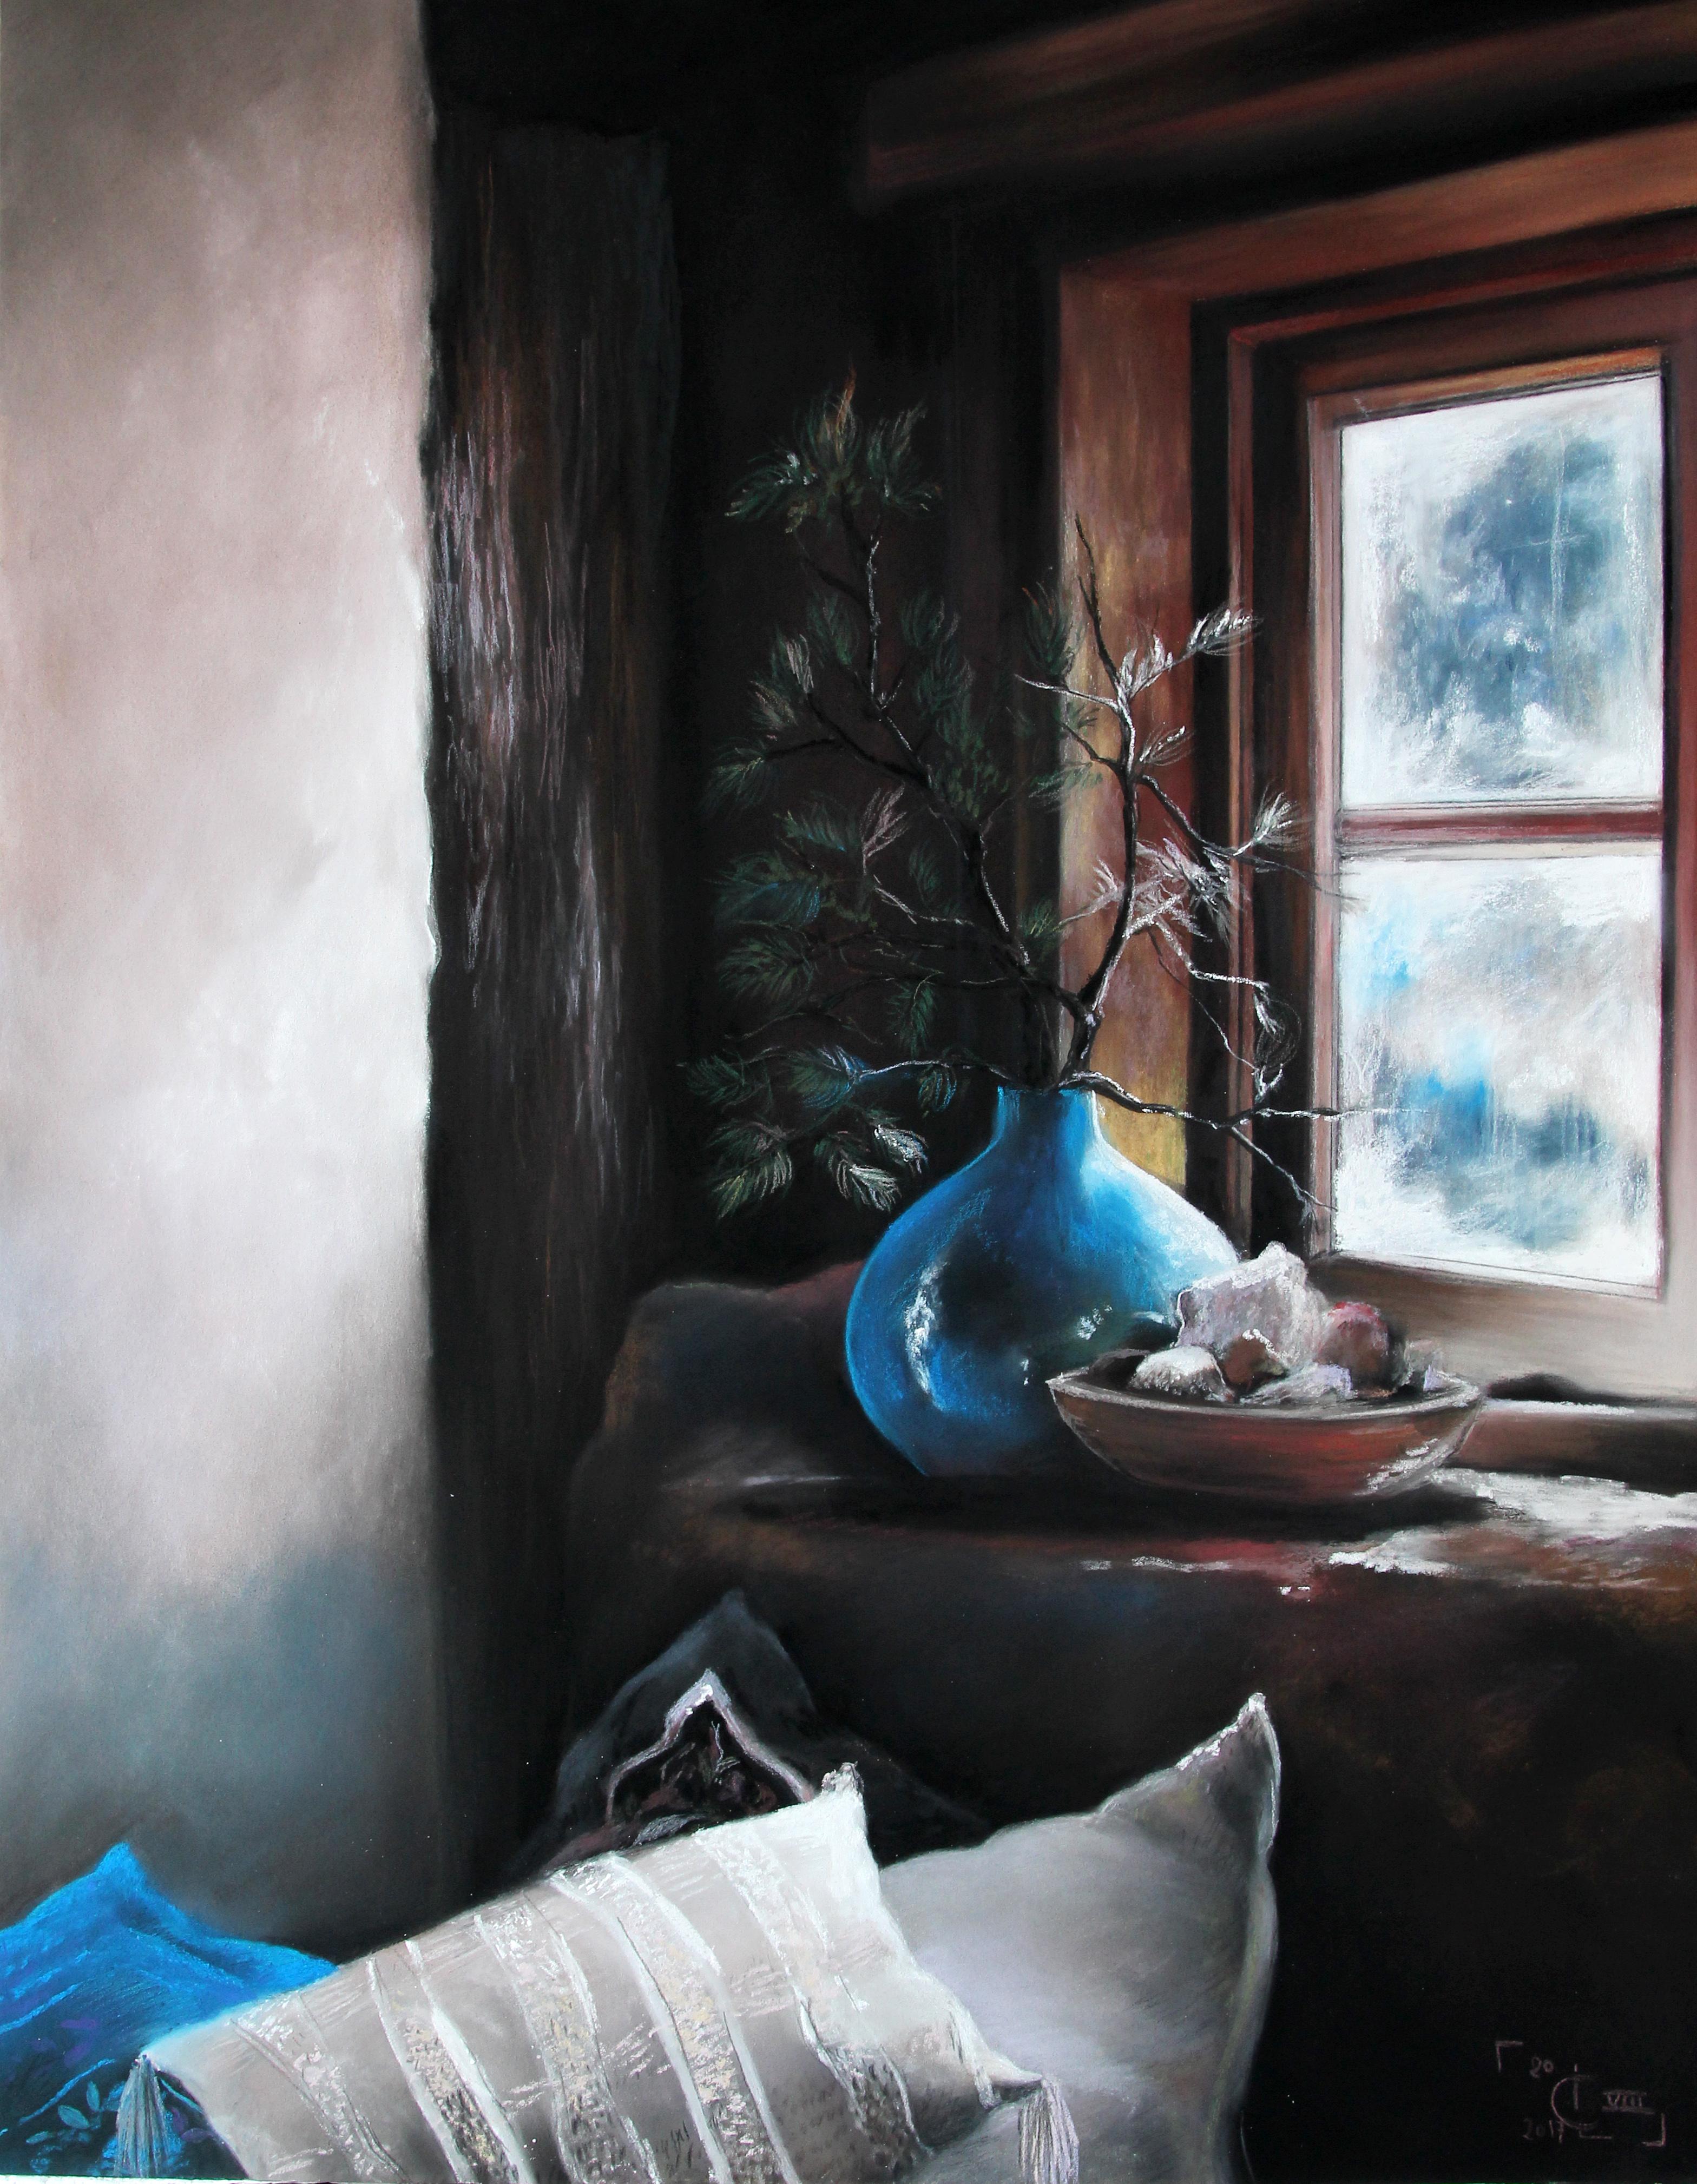 Le vase bleu